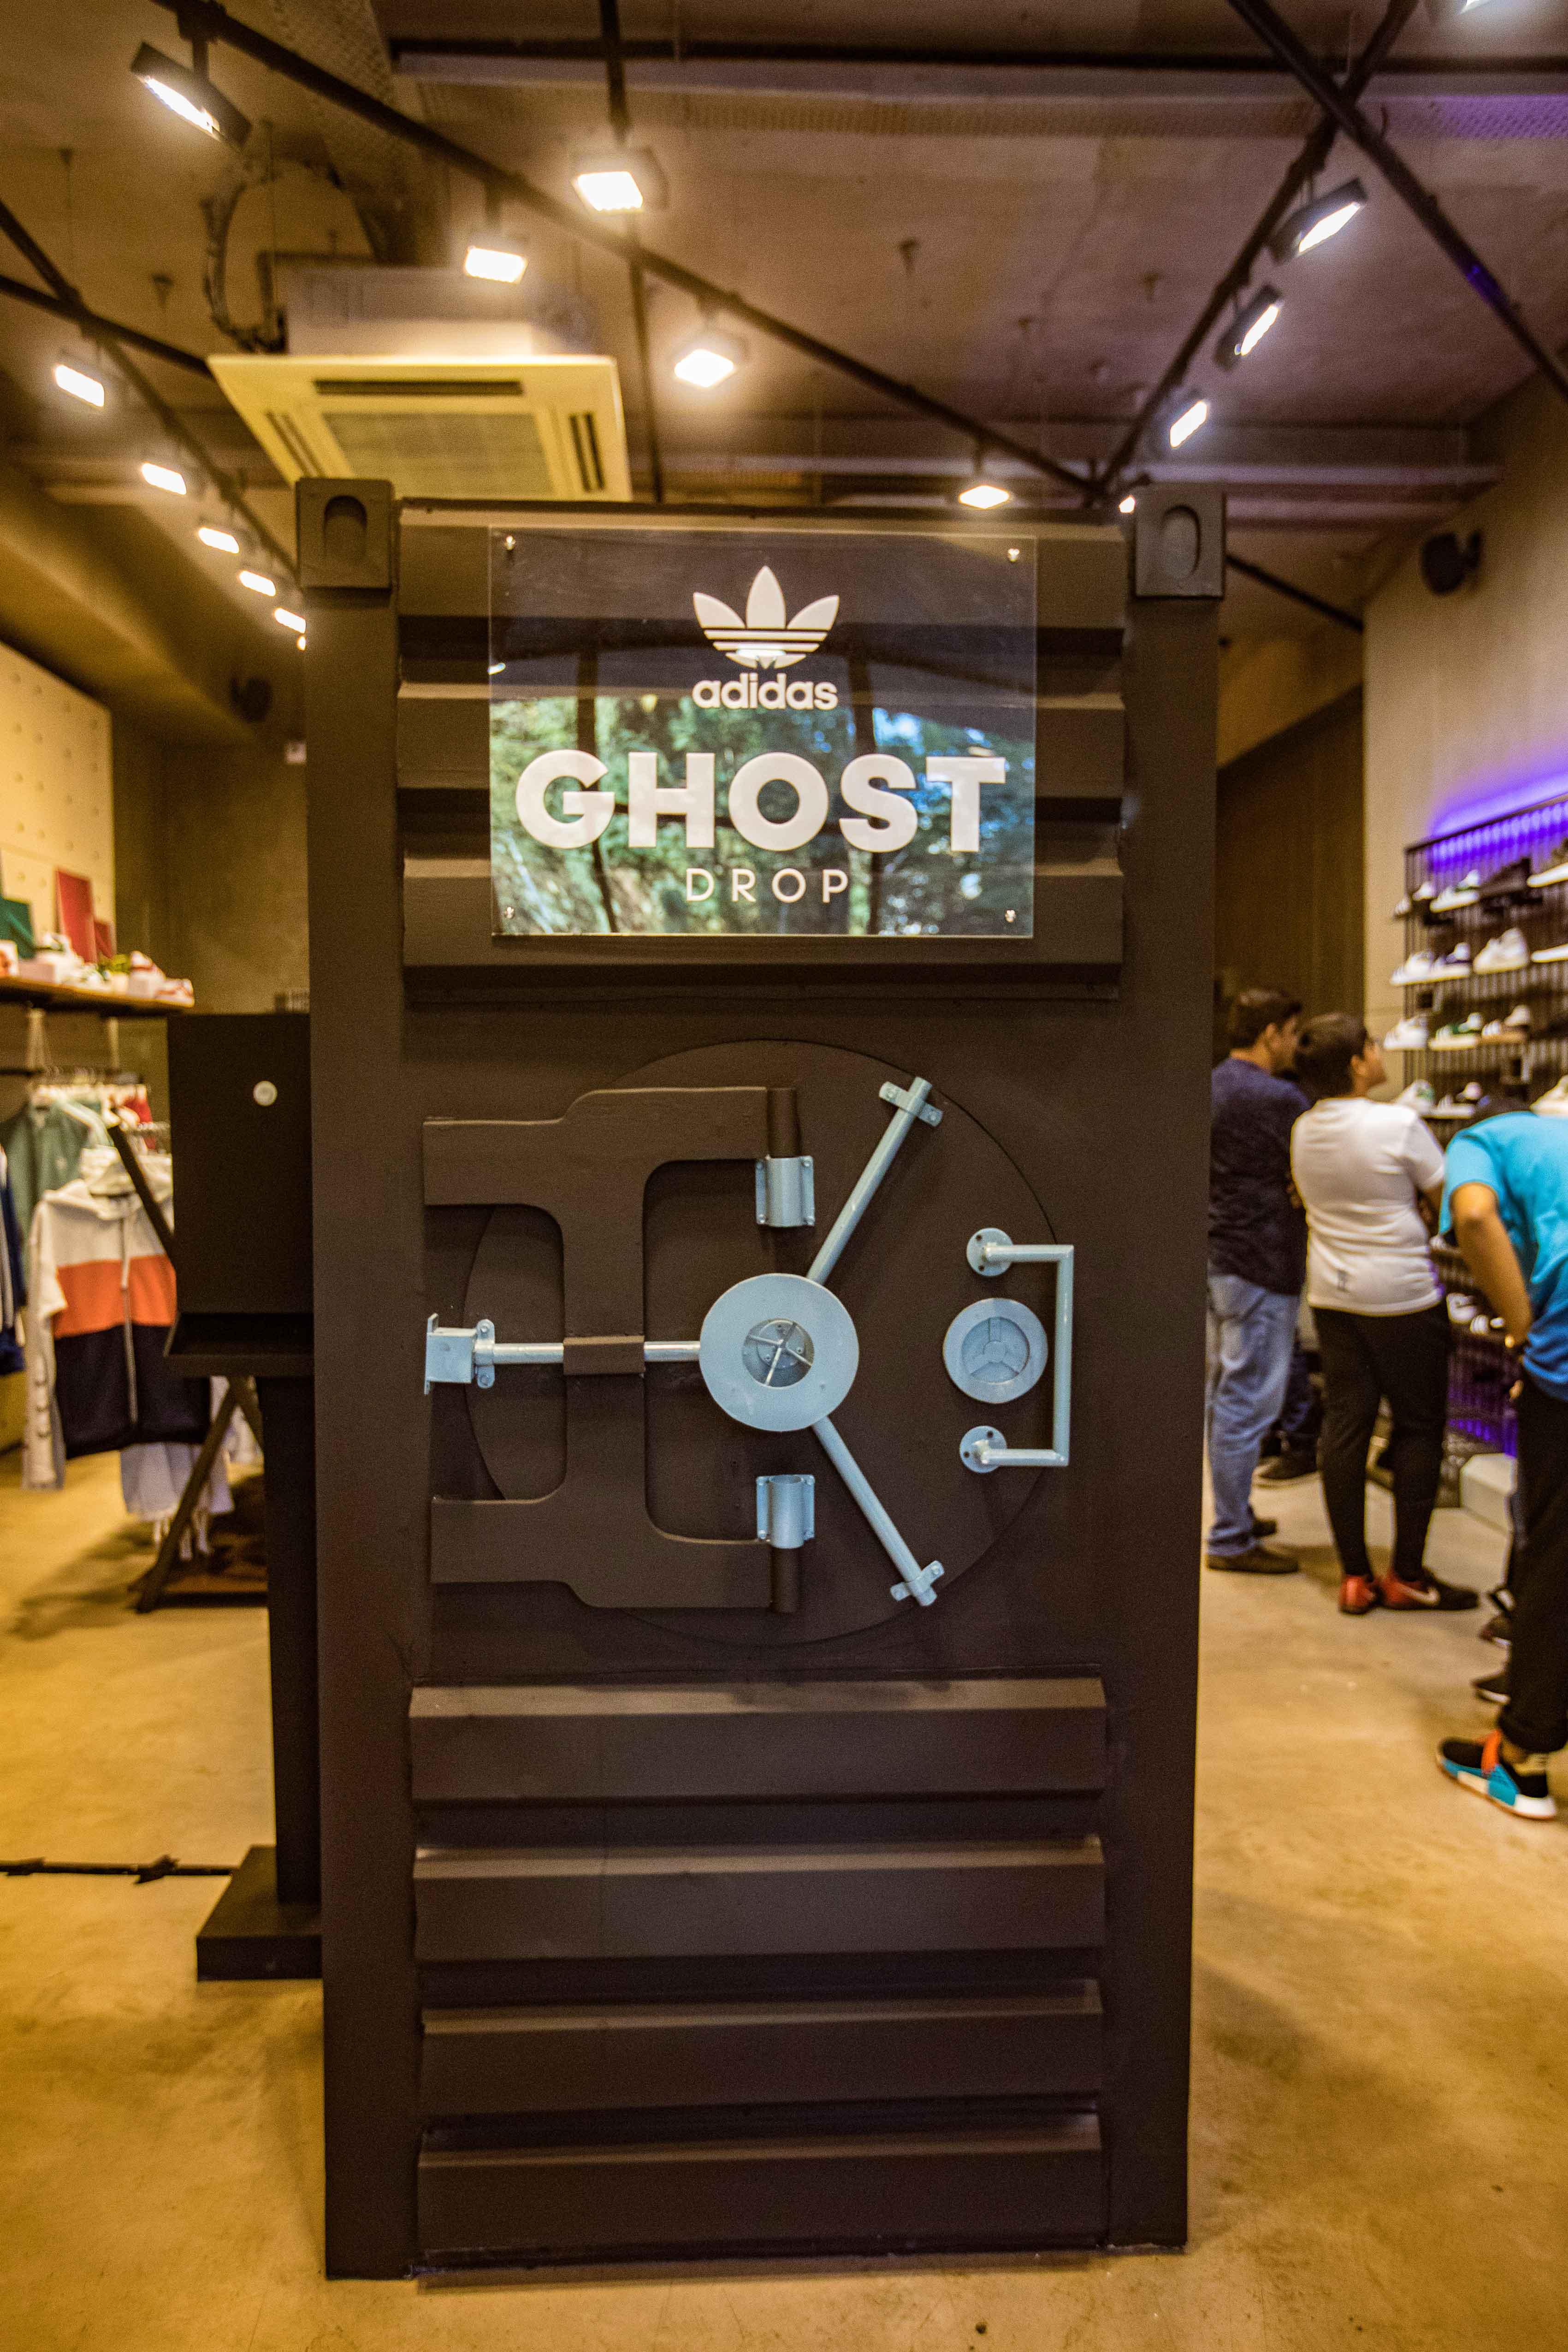 Adidas Originals Ghost Drop | bowties